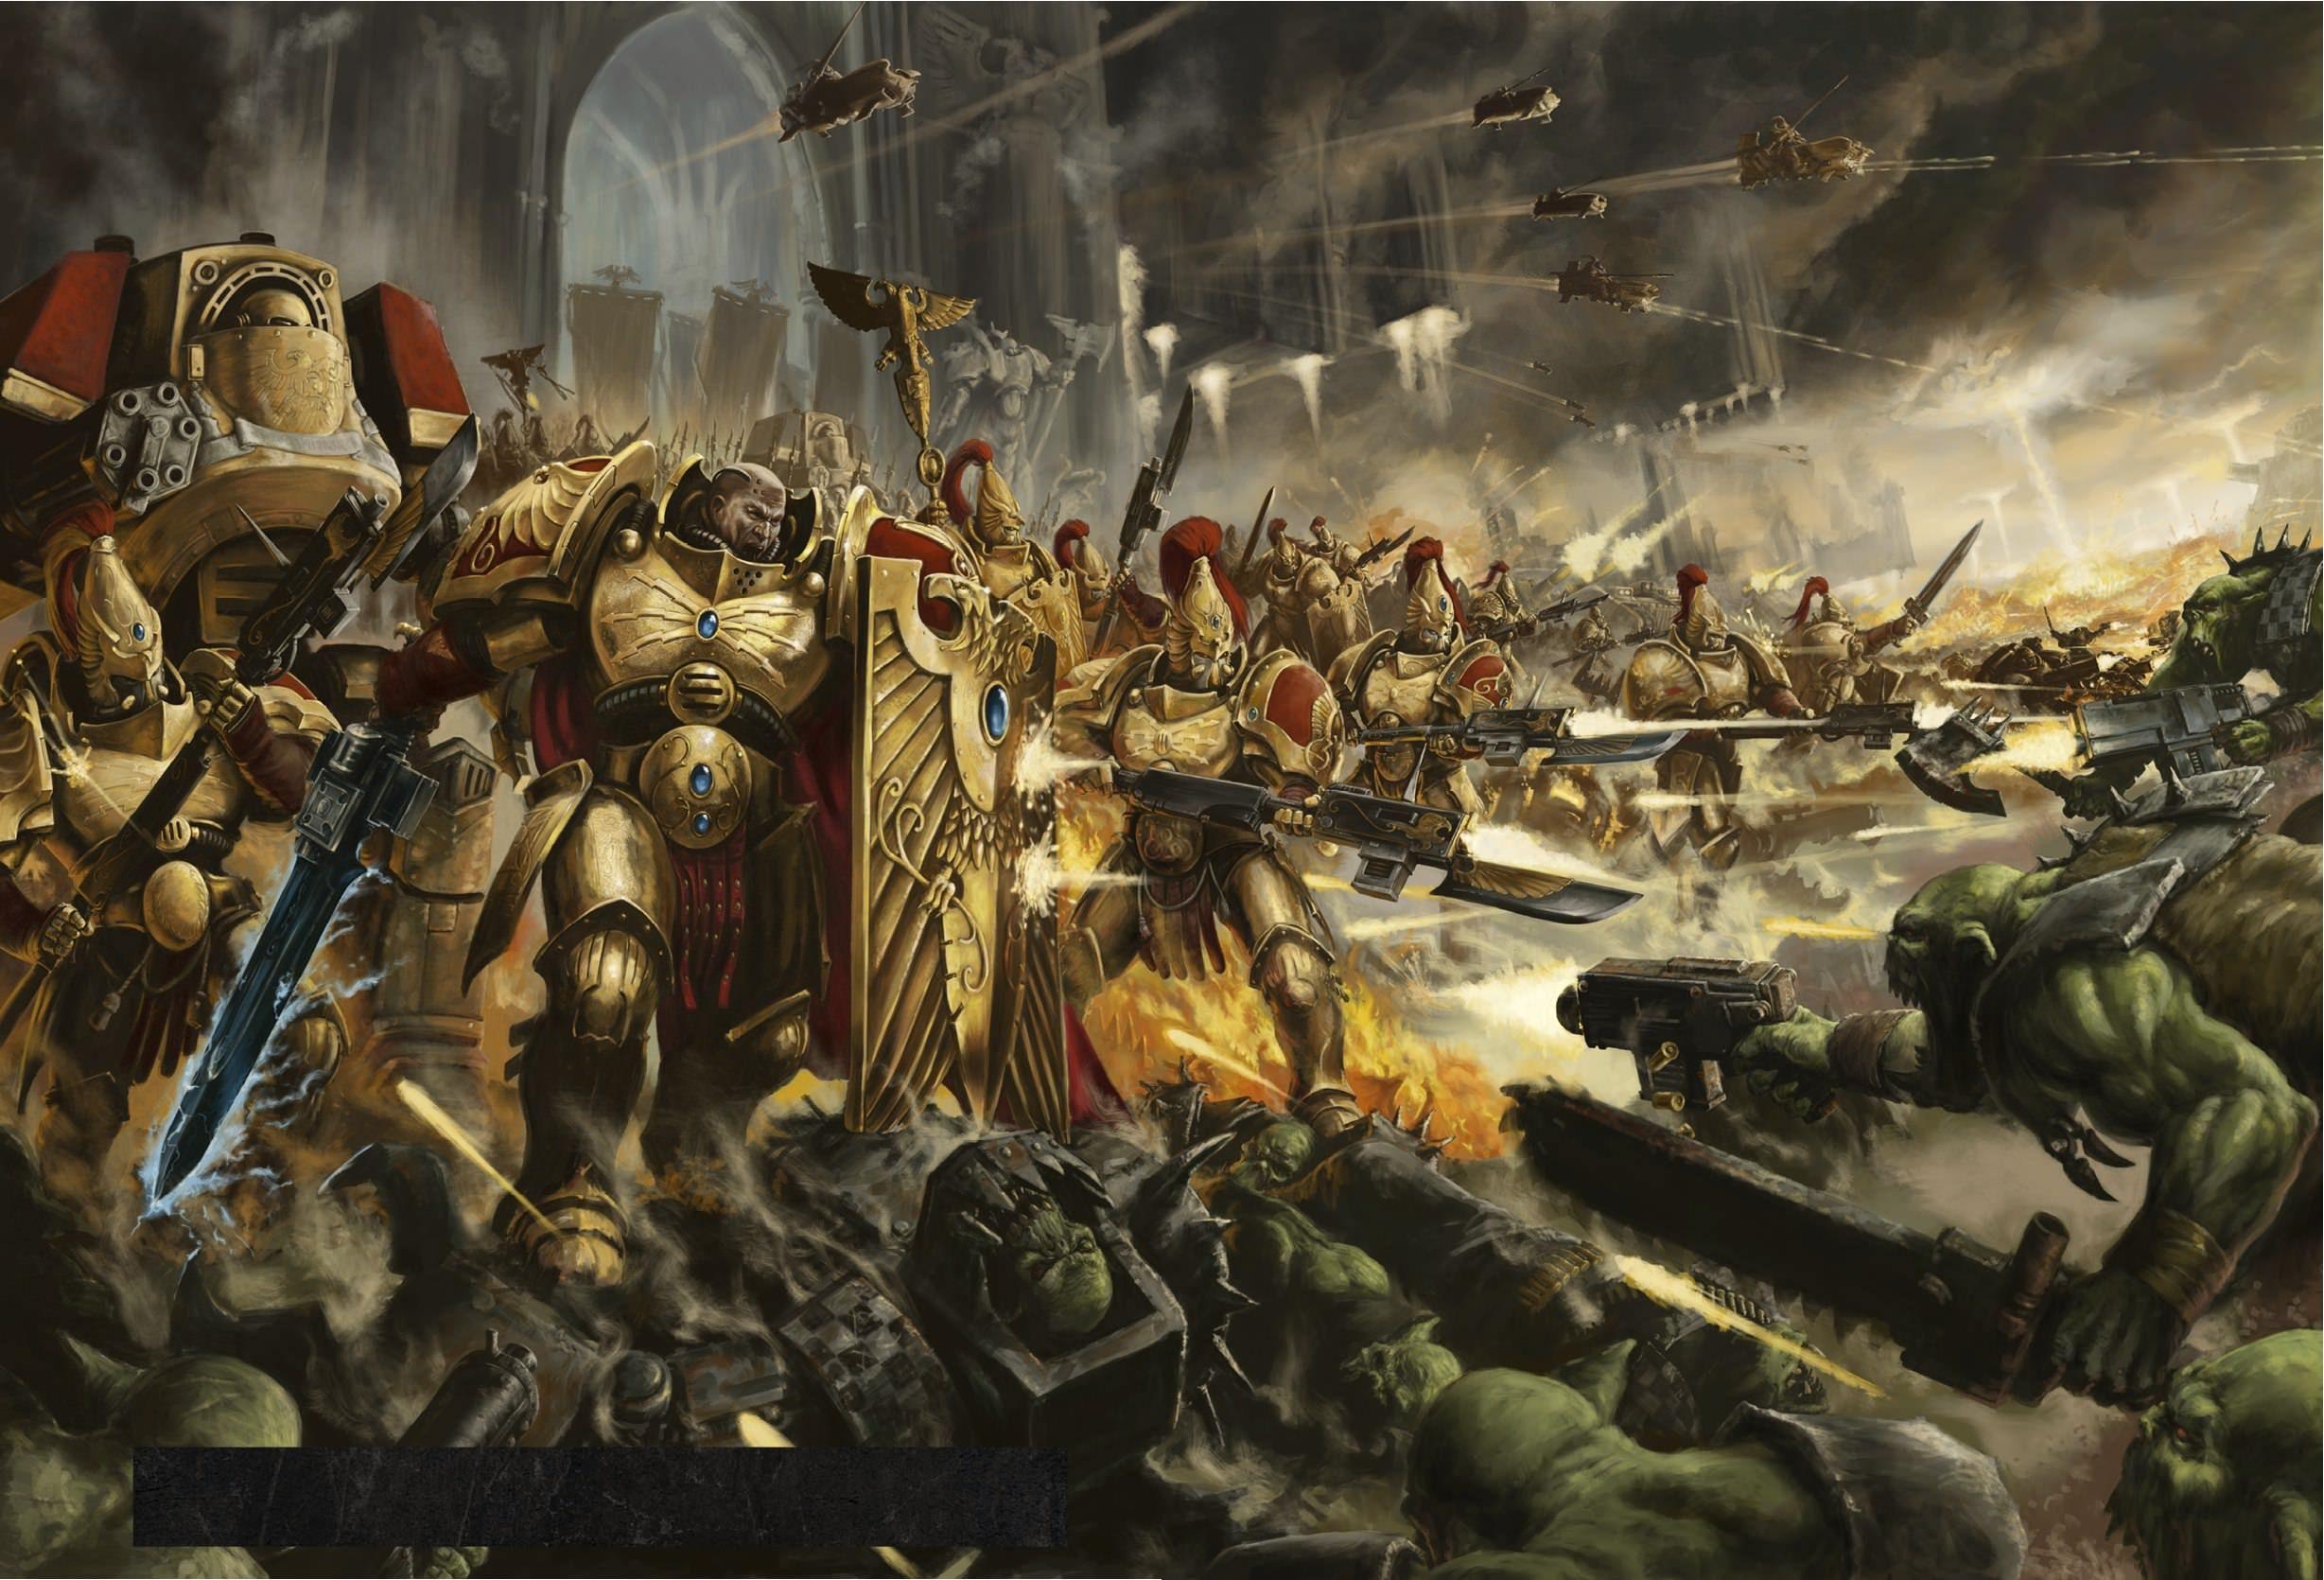 The Magic Of The Internet Imgur Warhammer 40k Artwork Warhammer Warhammer 40k Art